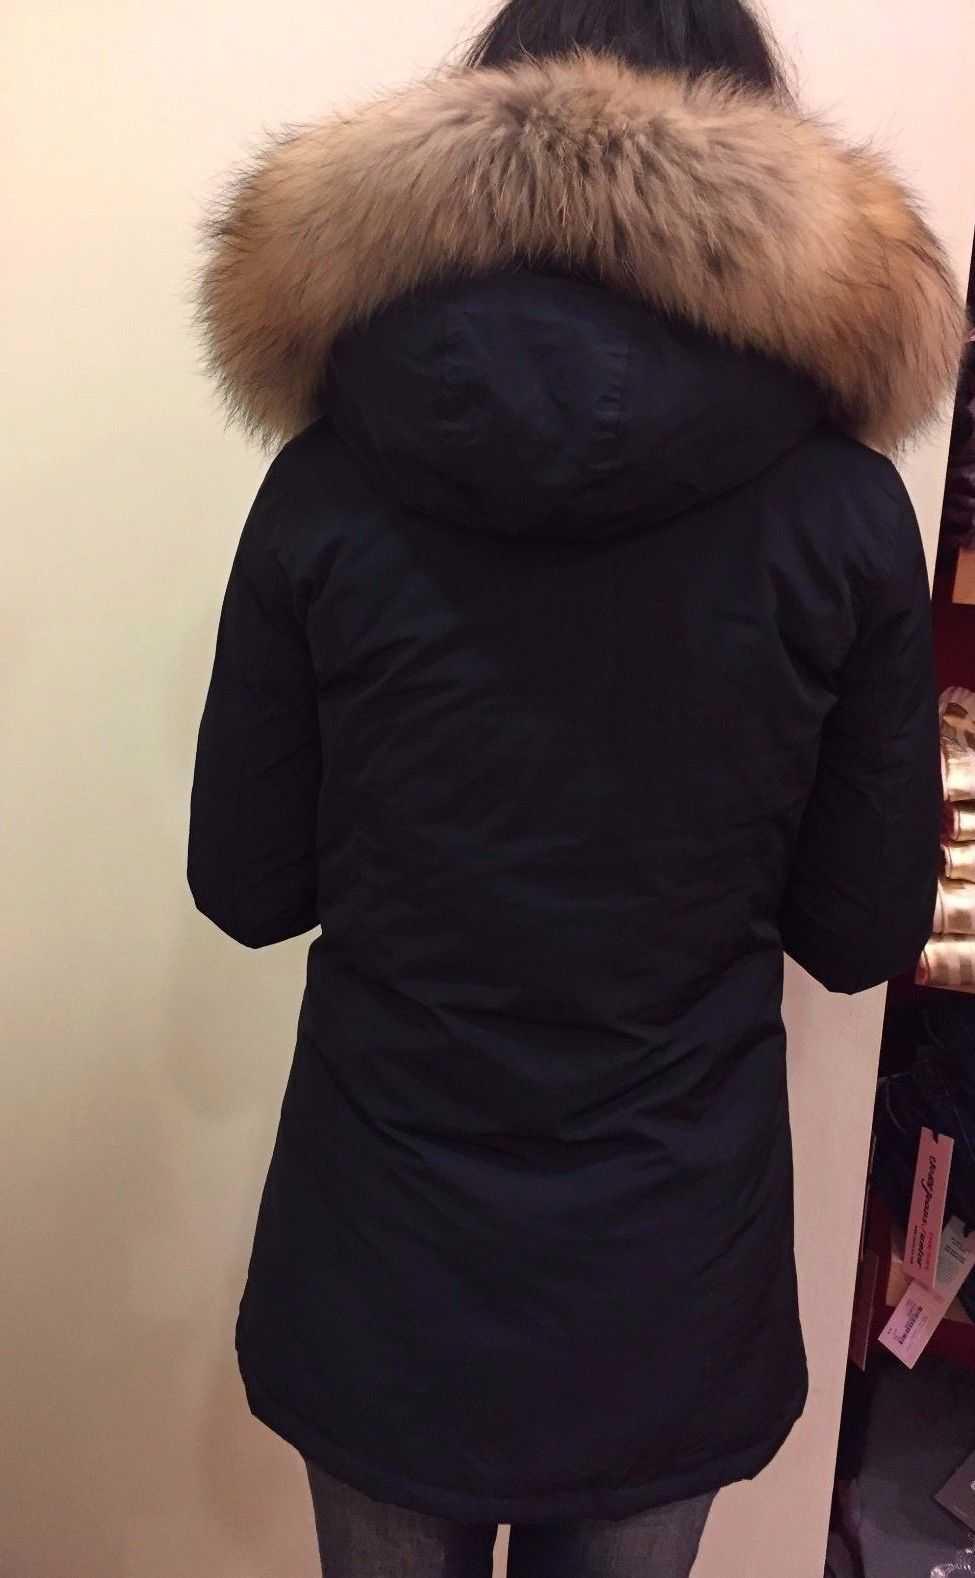 Blu Luxury Taglia Arctic Sconto 12 Anni Gs Woolrich Parka Donna Girl xwFIIZ